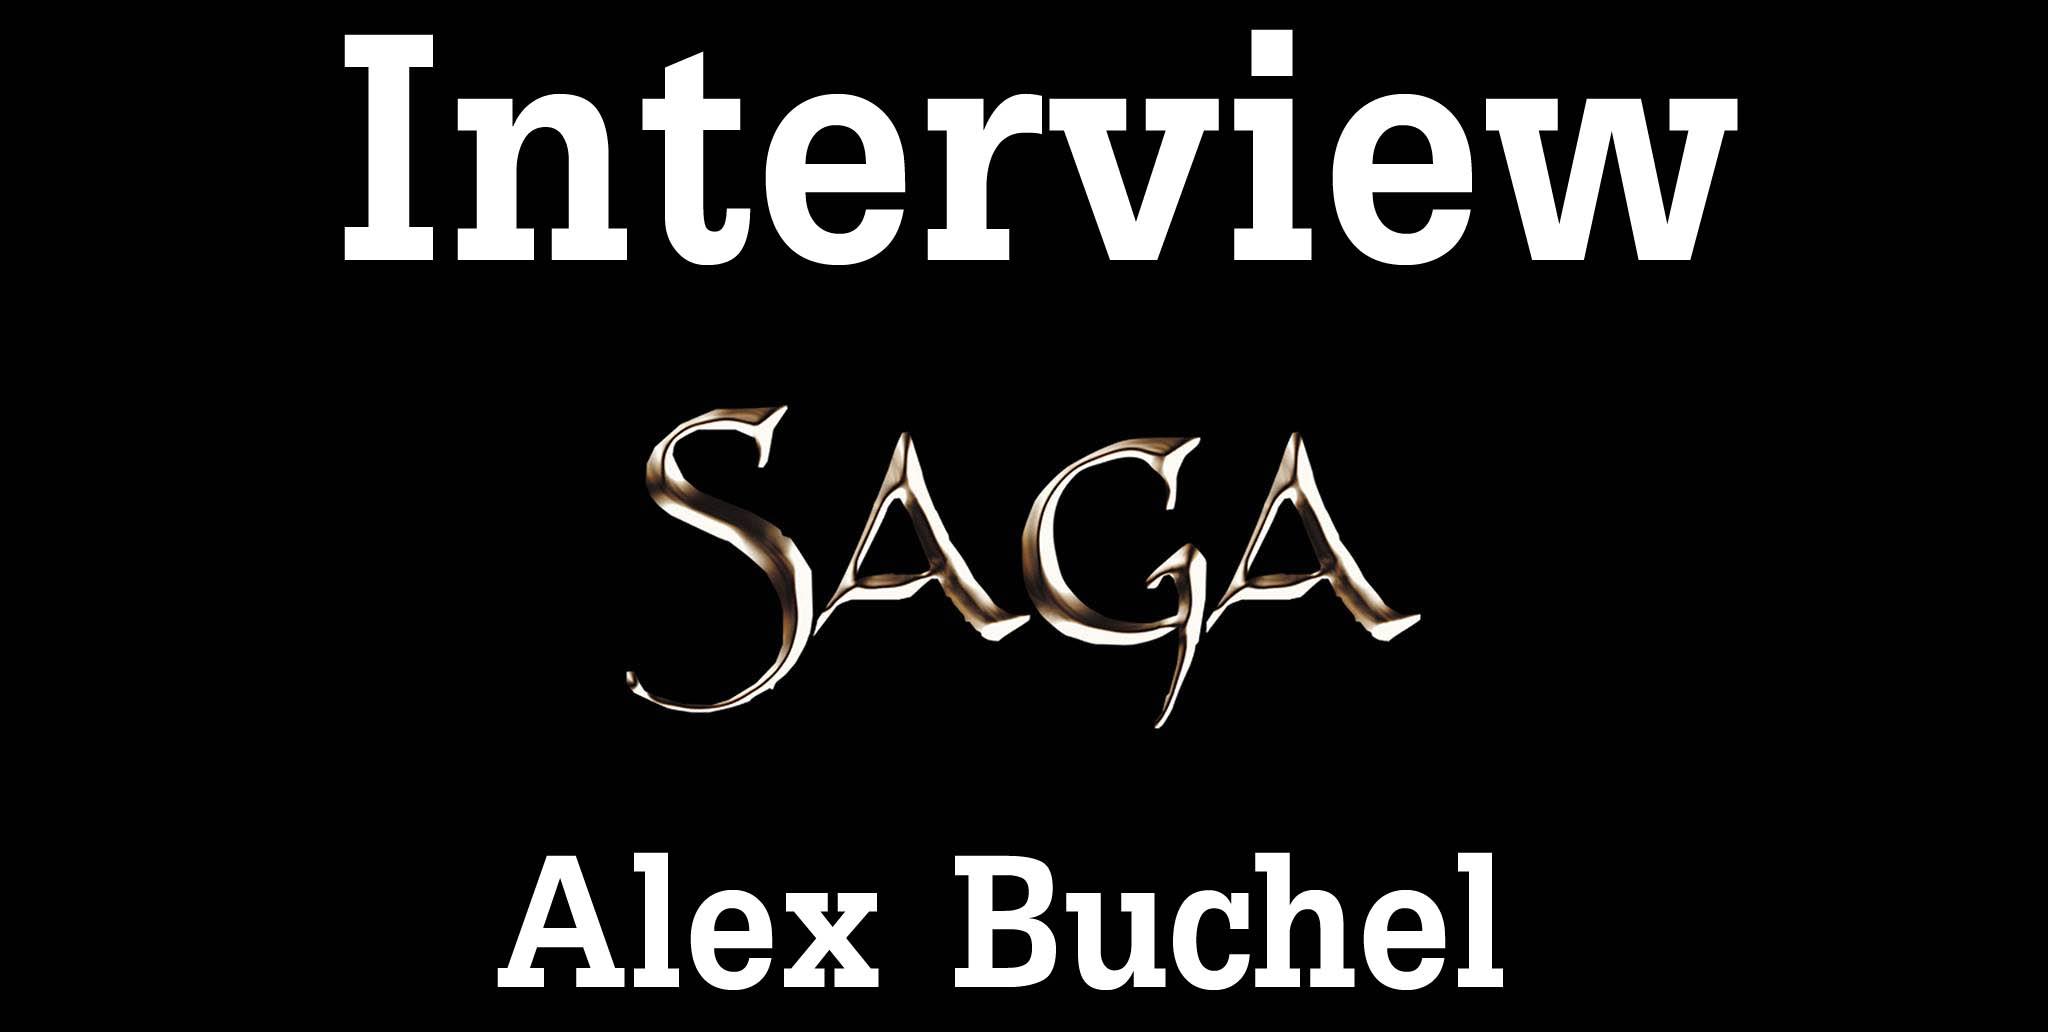 SAGA Nouvelle Edition - Interview